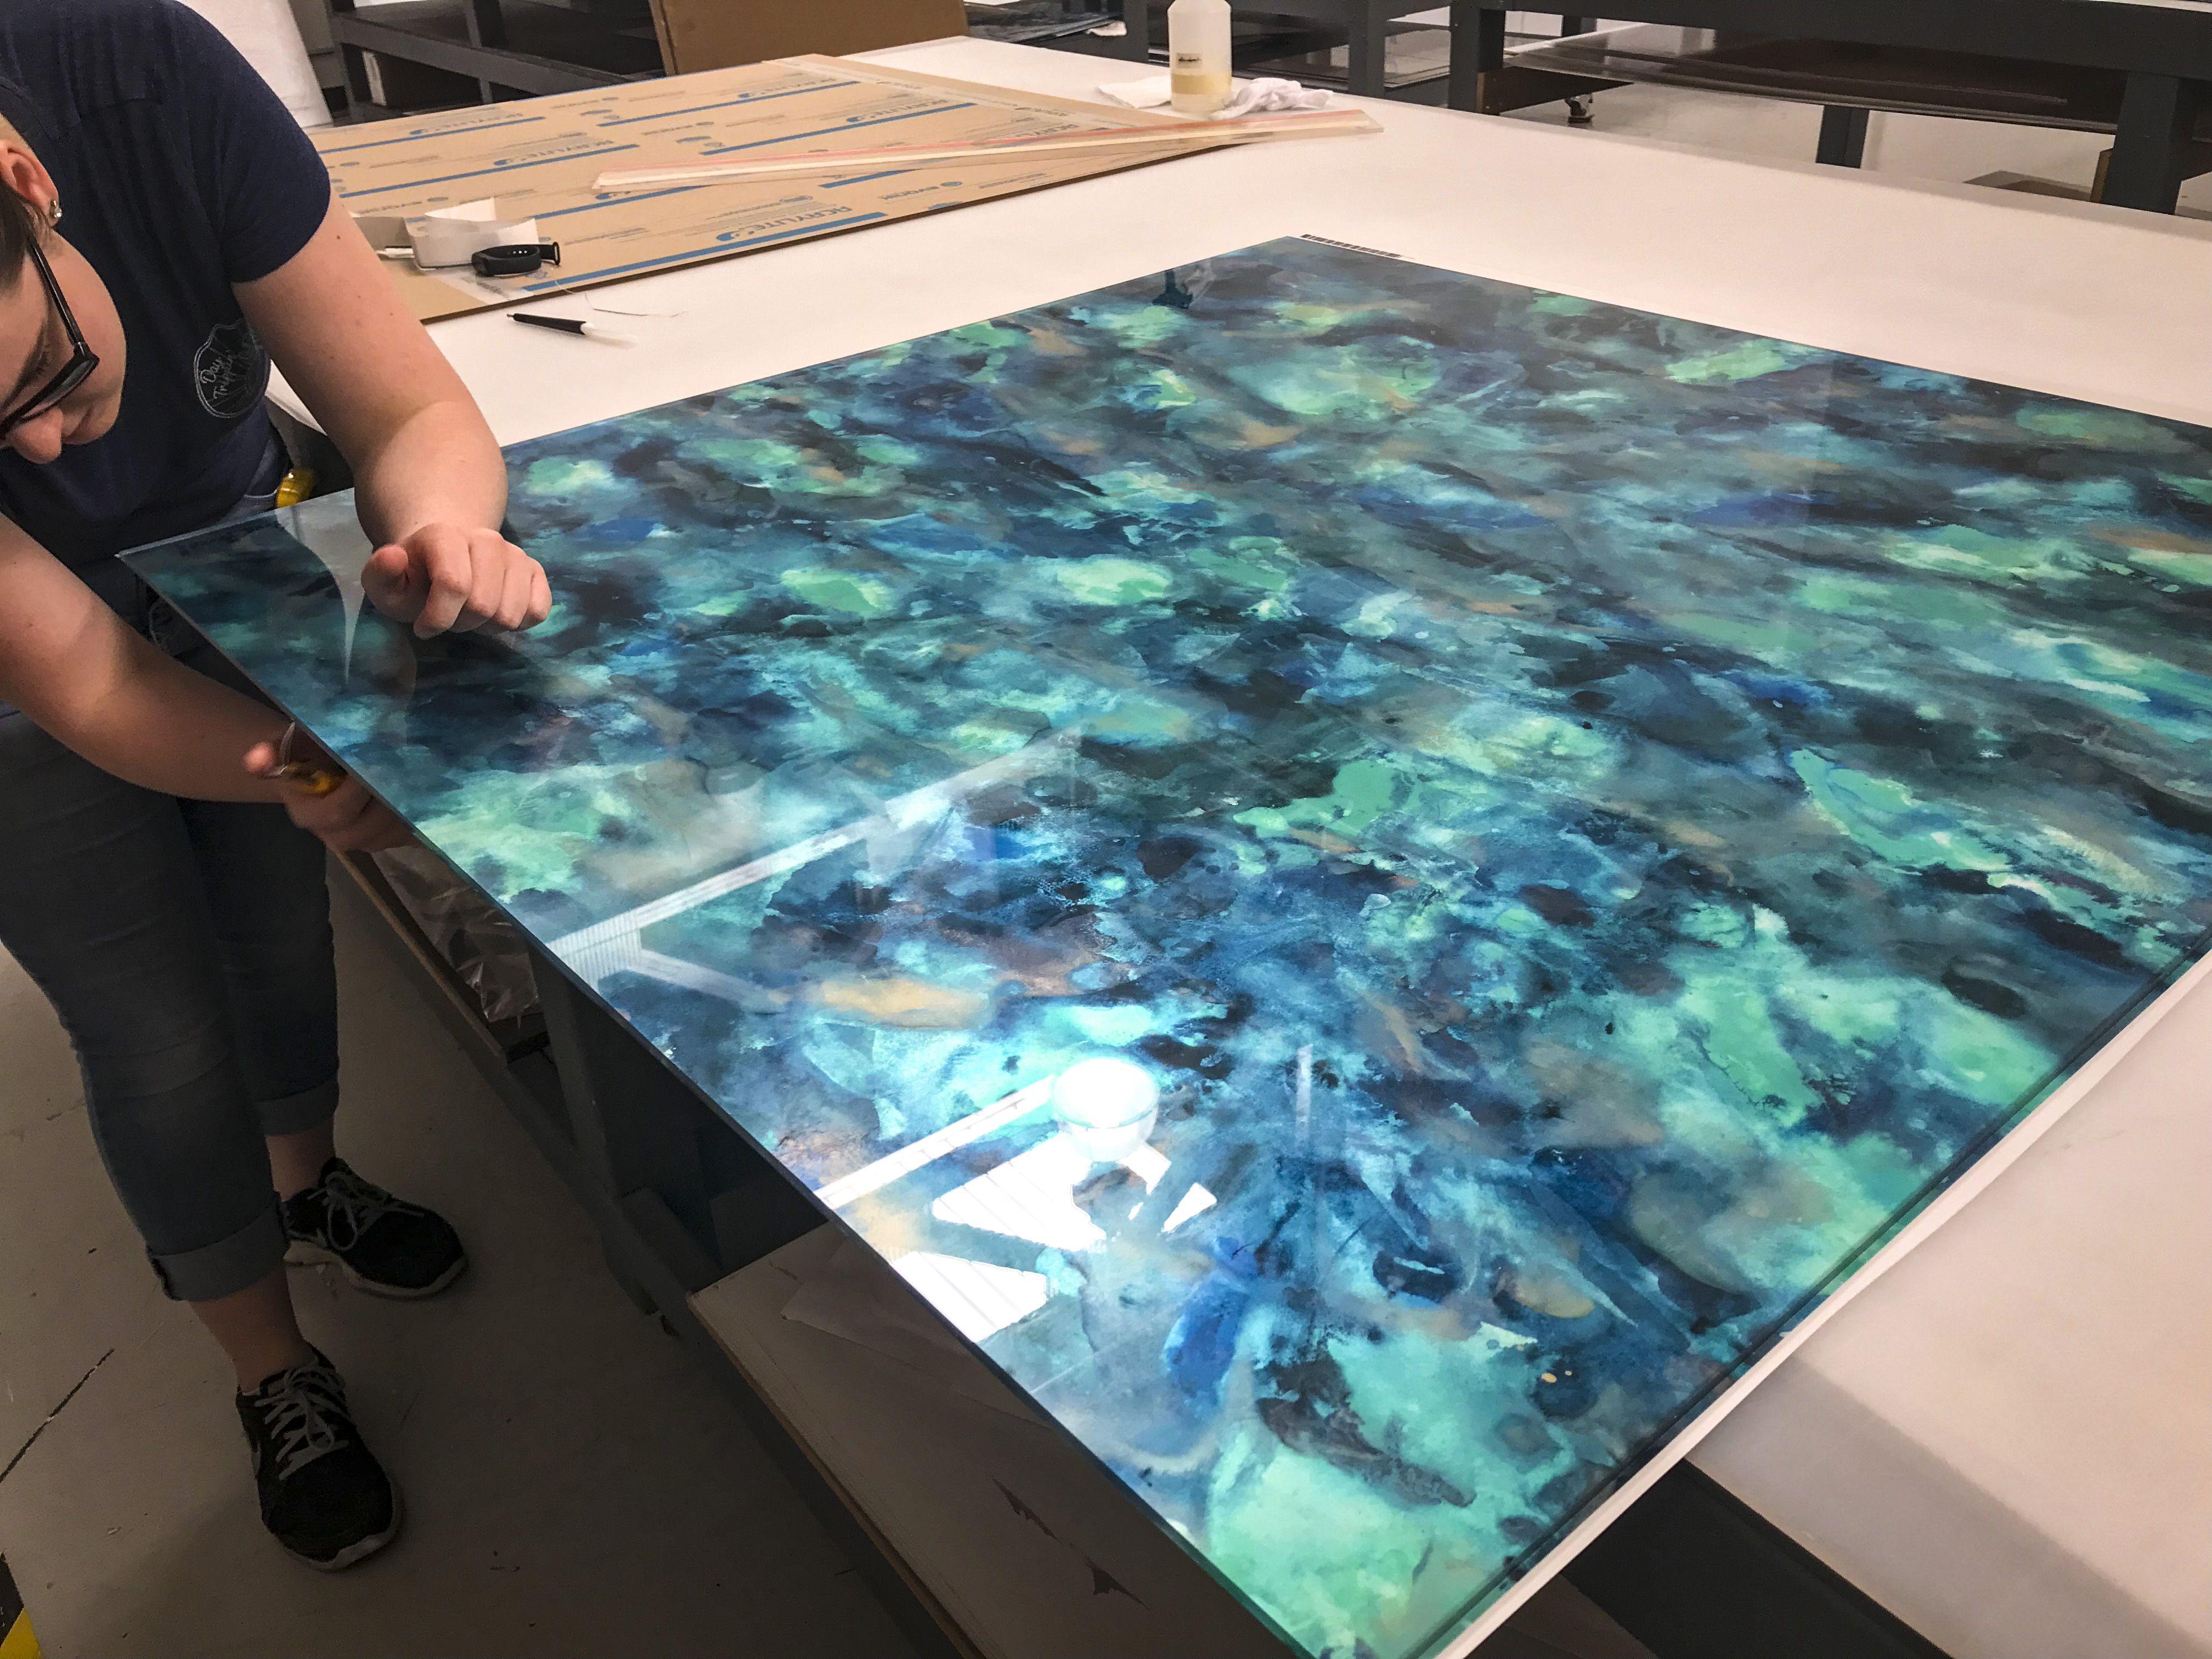 Custom Acrylic Art Print In Process Acrylic Art Print Professional Printing Definition Art